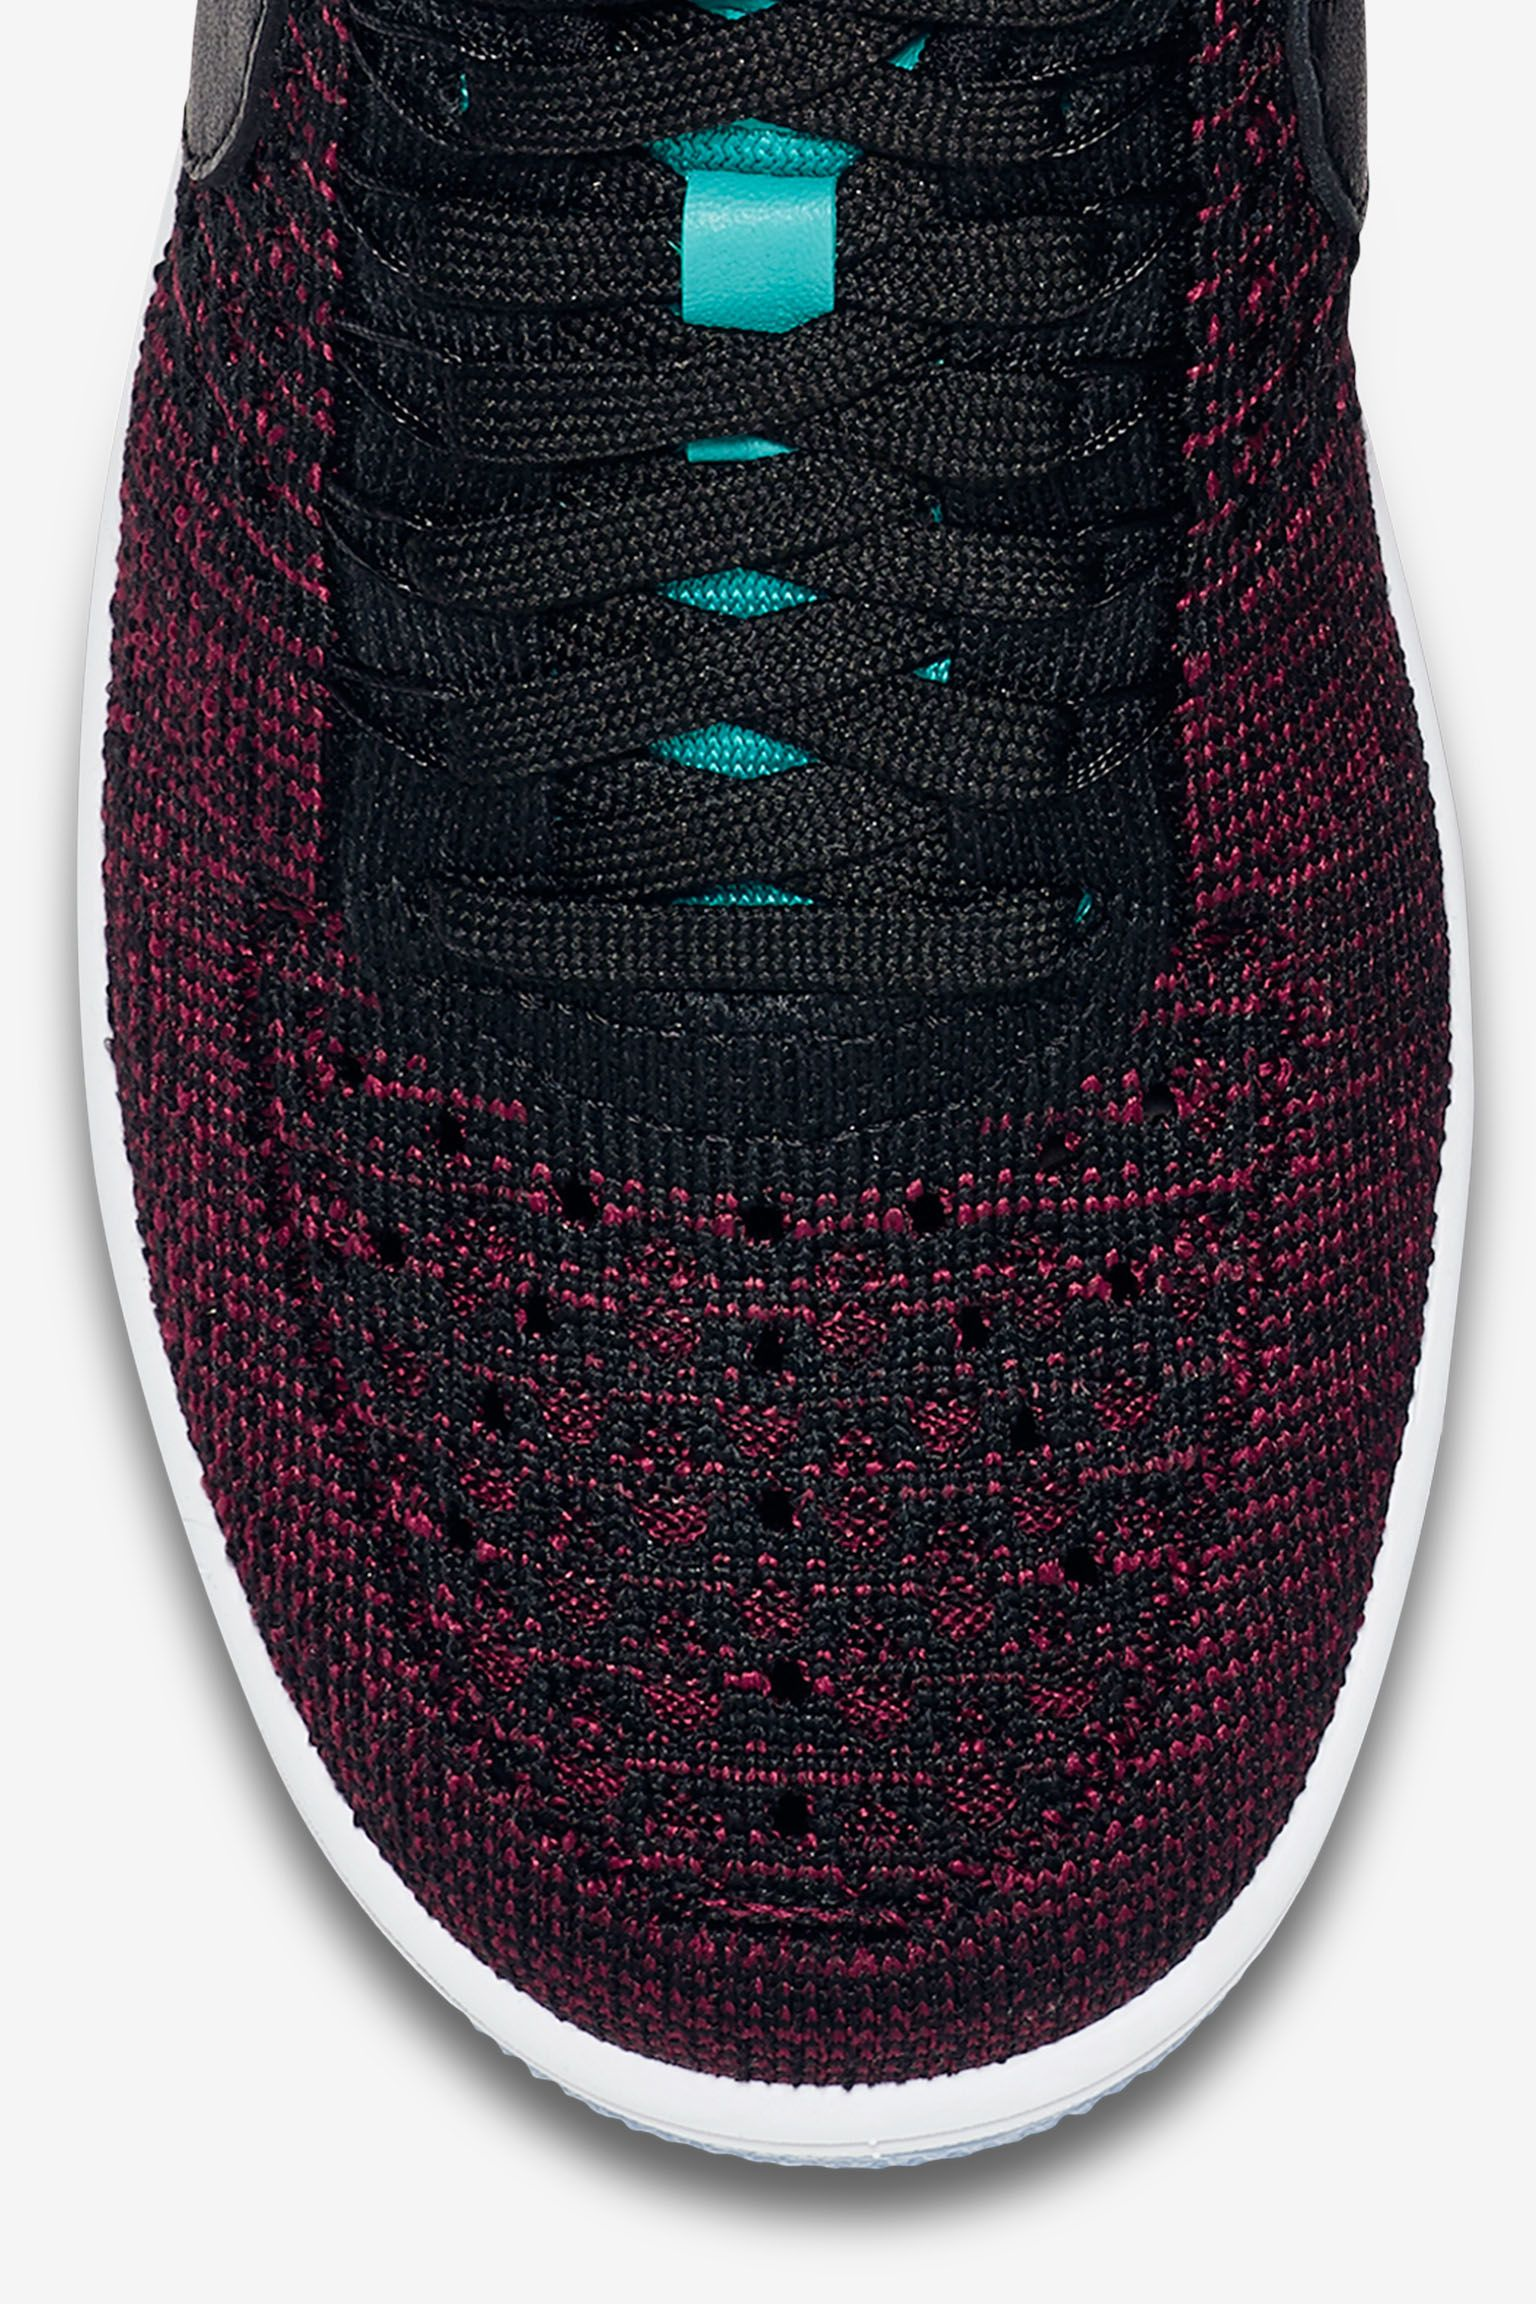 Women's Nike Air Force 1 Ultra Flyknit Low 'Team Red & Clear Jade' Release Date